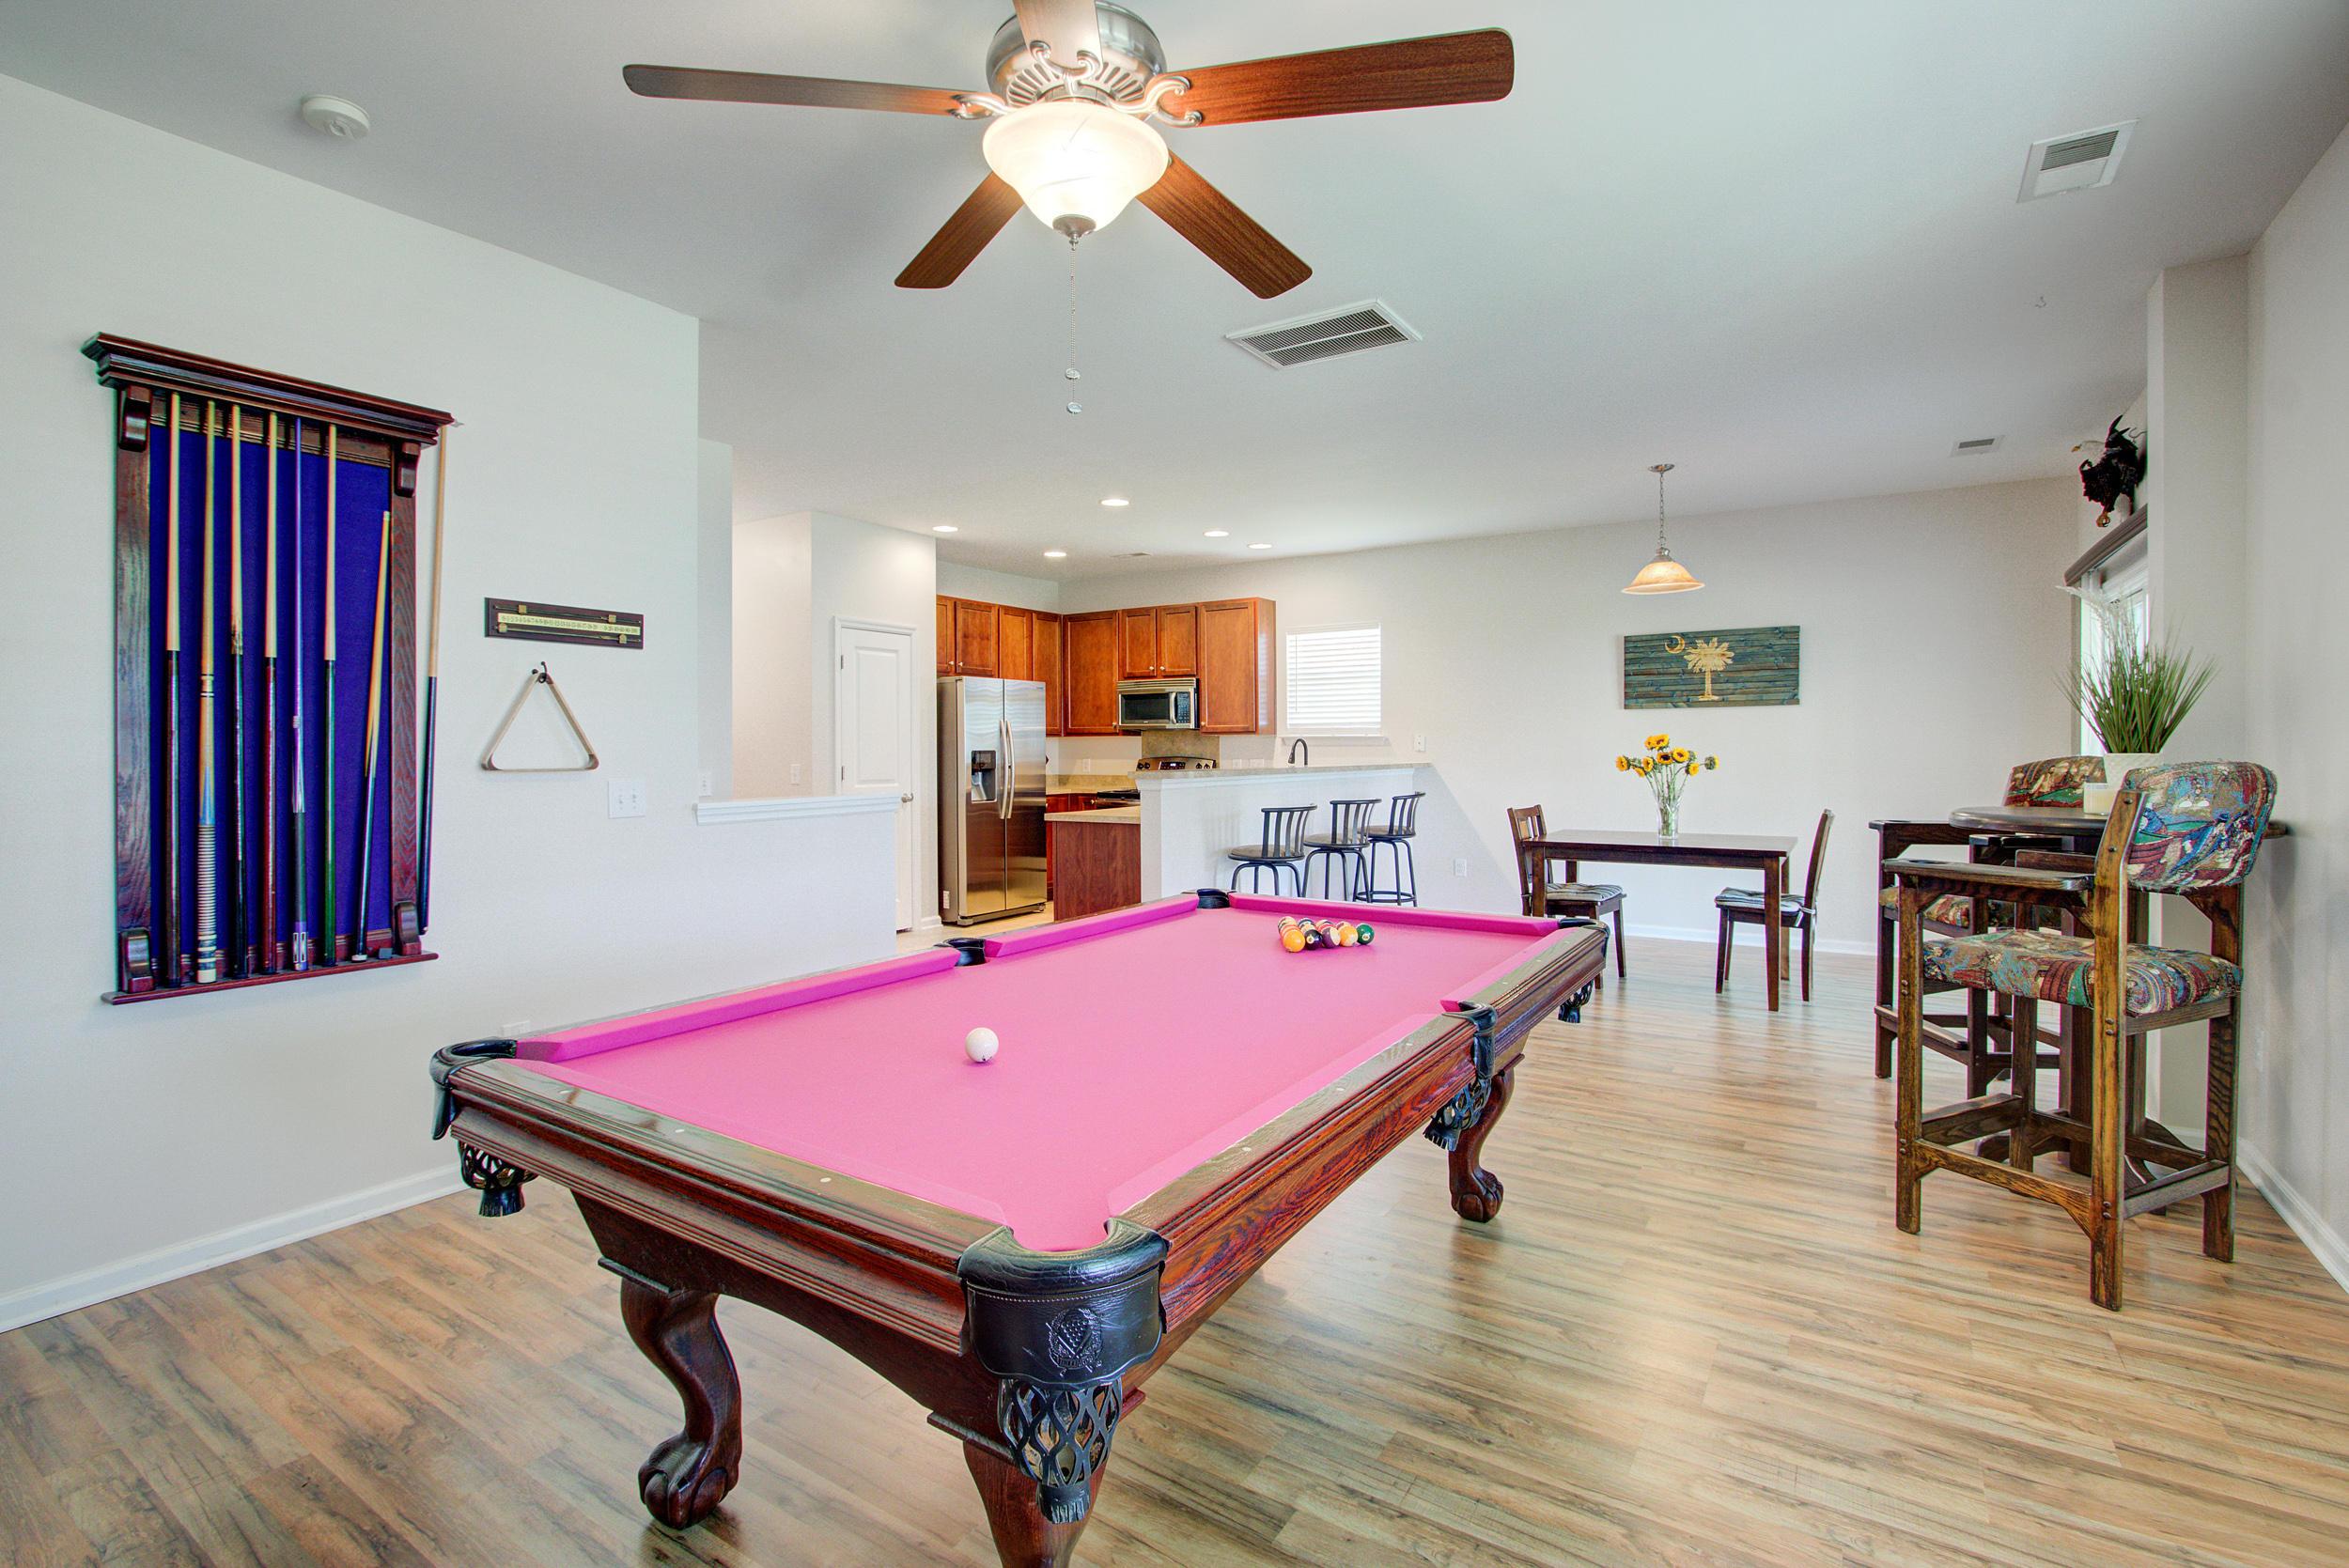 Oakley Pointe Homes For Sale - 576 English Oak, Moncks Corner, SC - 53